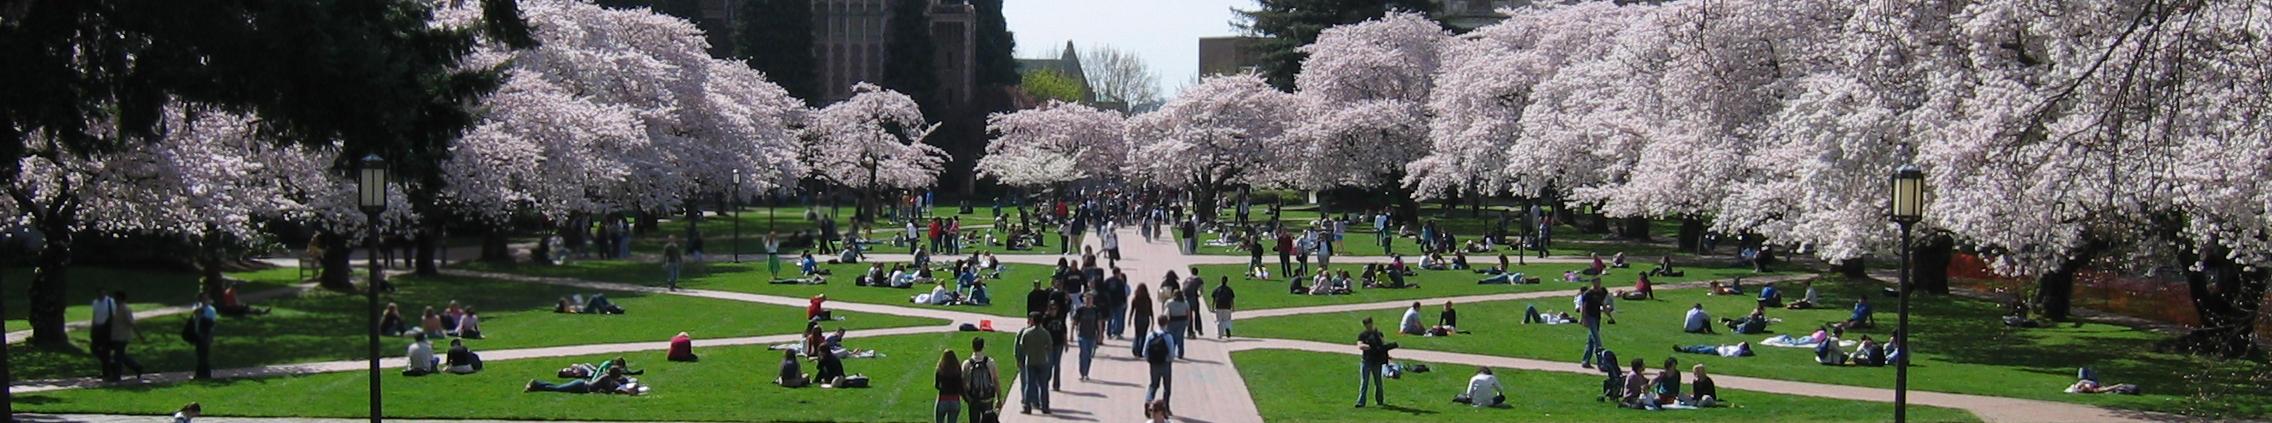 student insurance university insurance